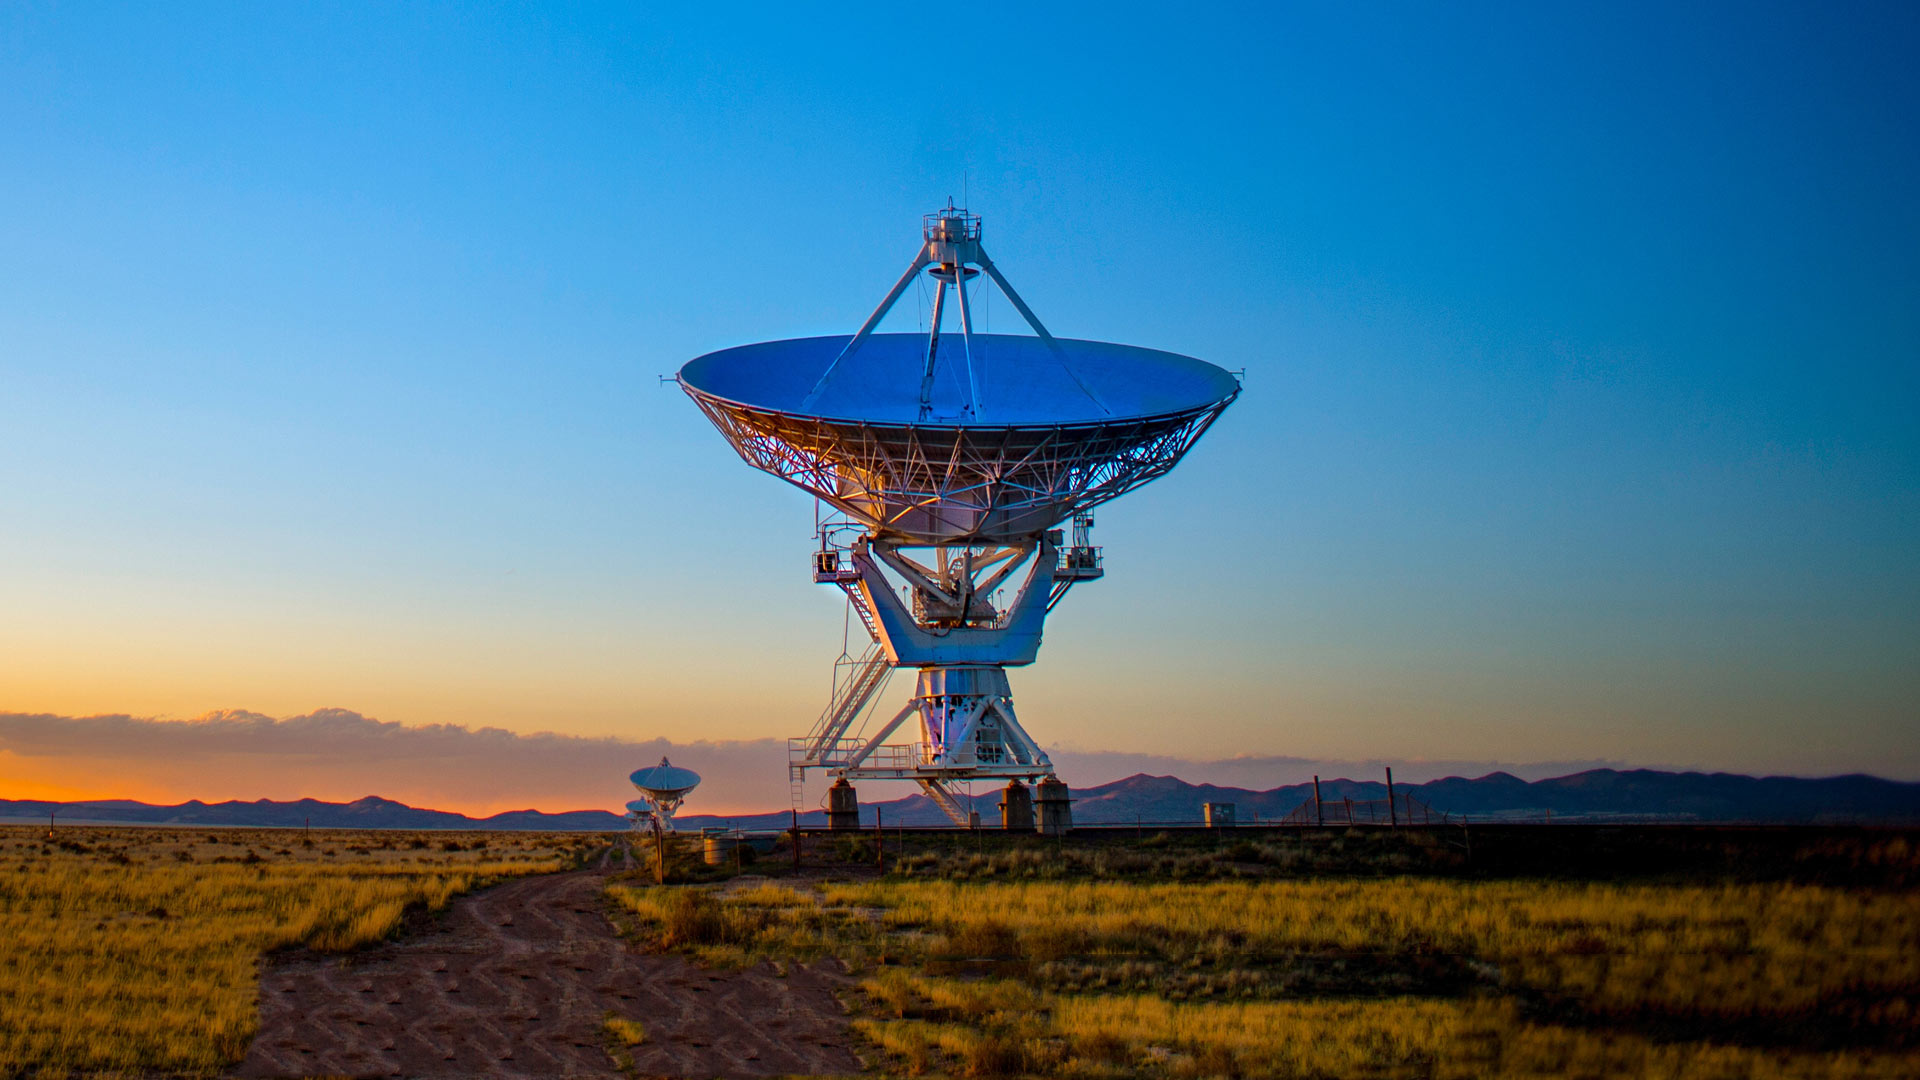 ICLG, Telecoms, Media & Internet Regulations in Turkey